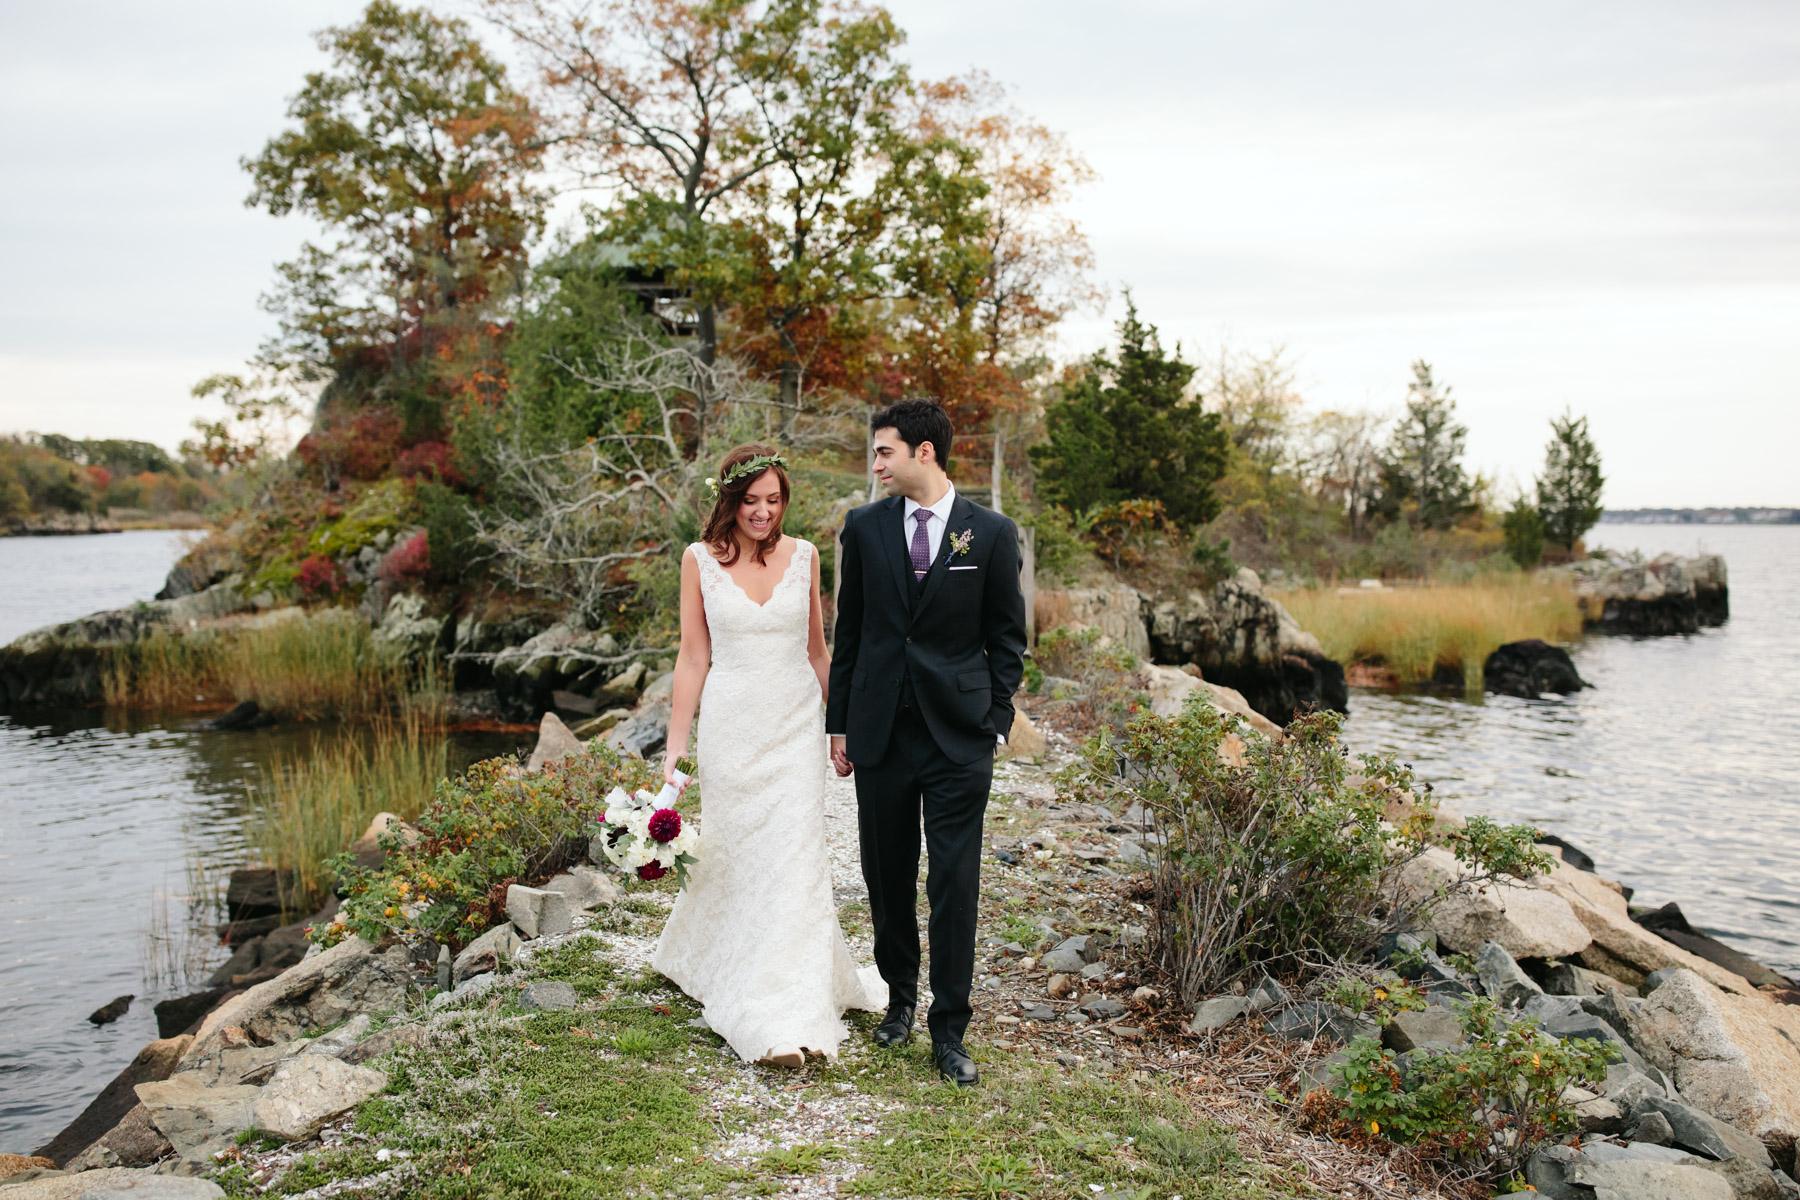 New England Wedding Photographer 57 Documentary Wedding Photographer Kerri Green